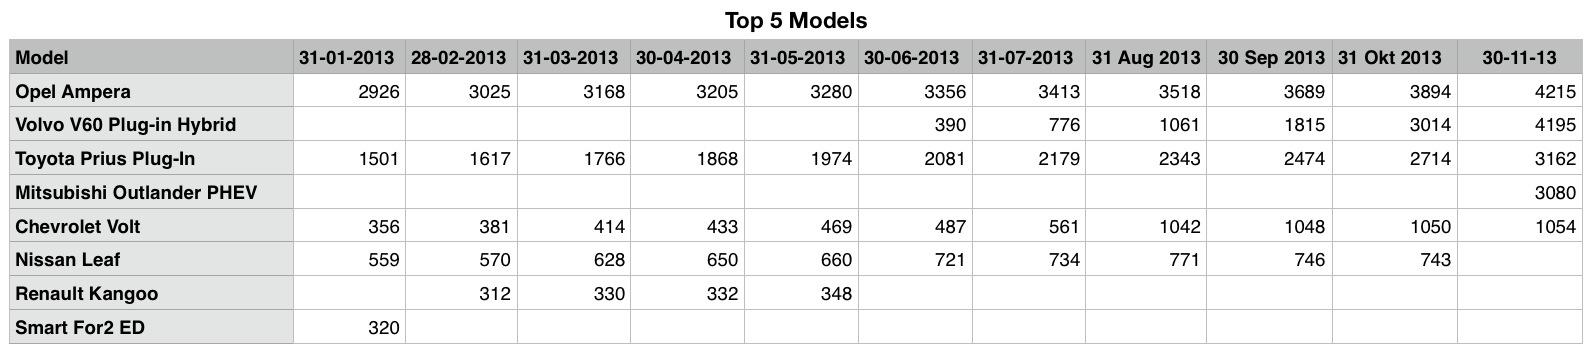 06 - EV Top5 Table.jpg